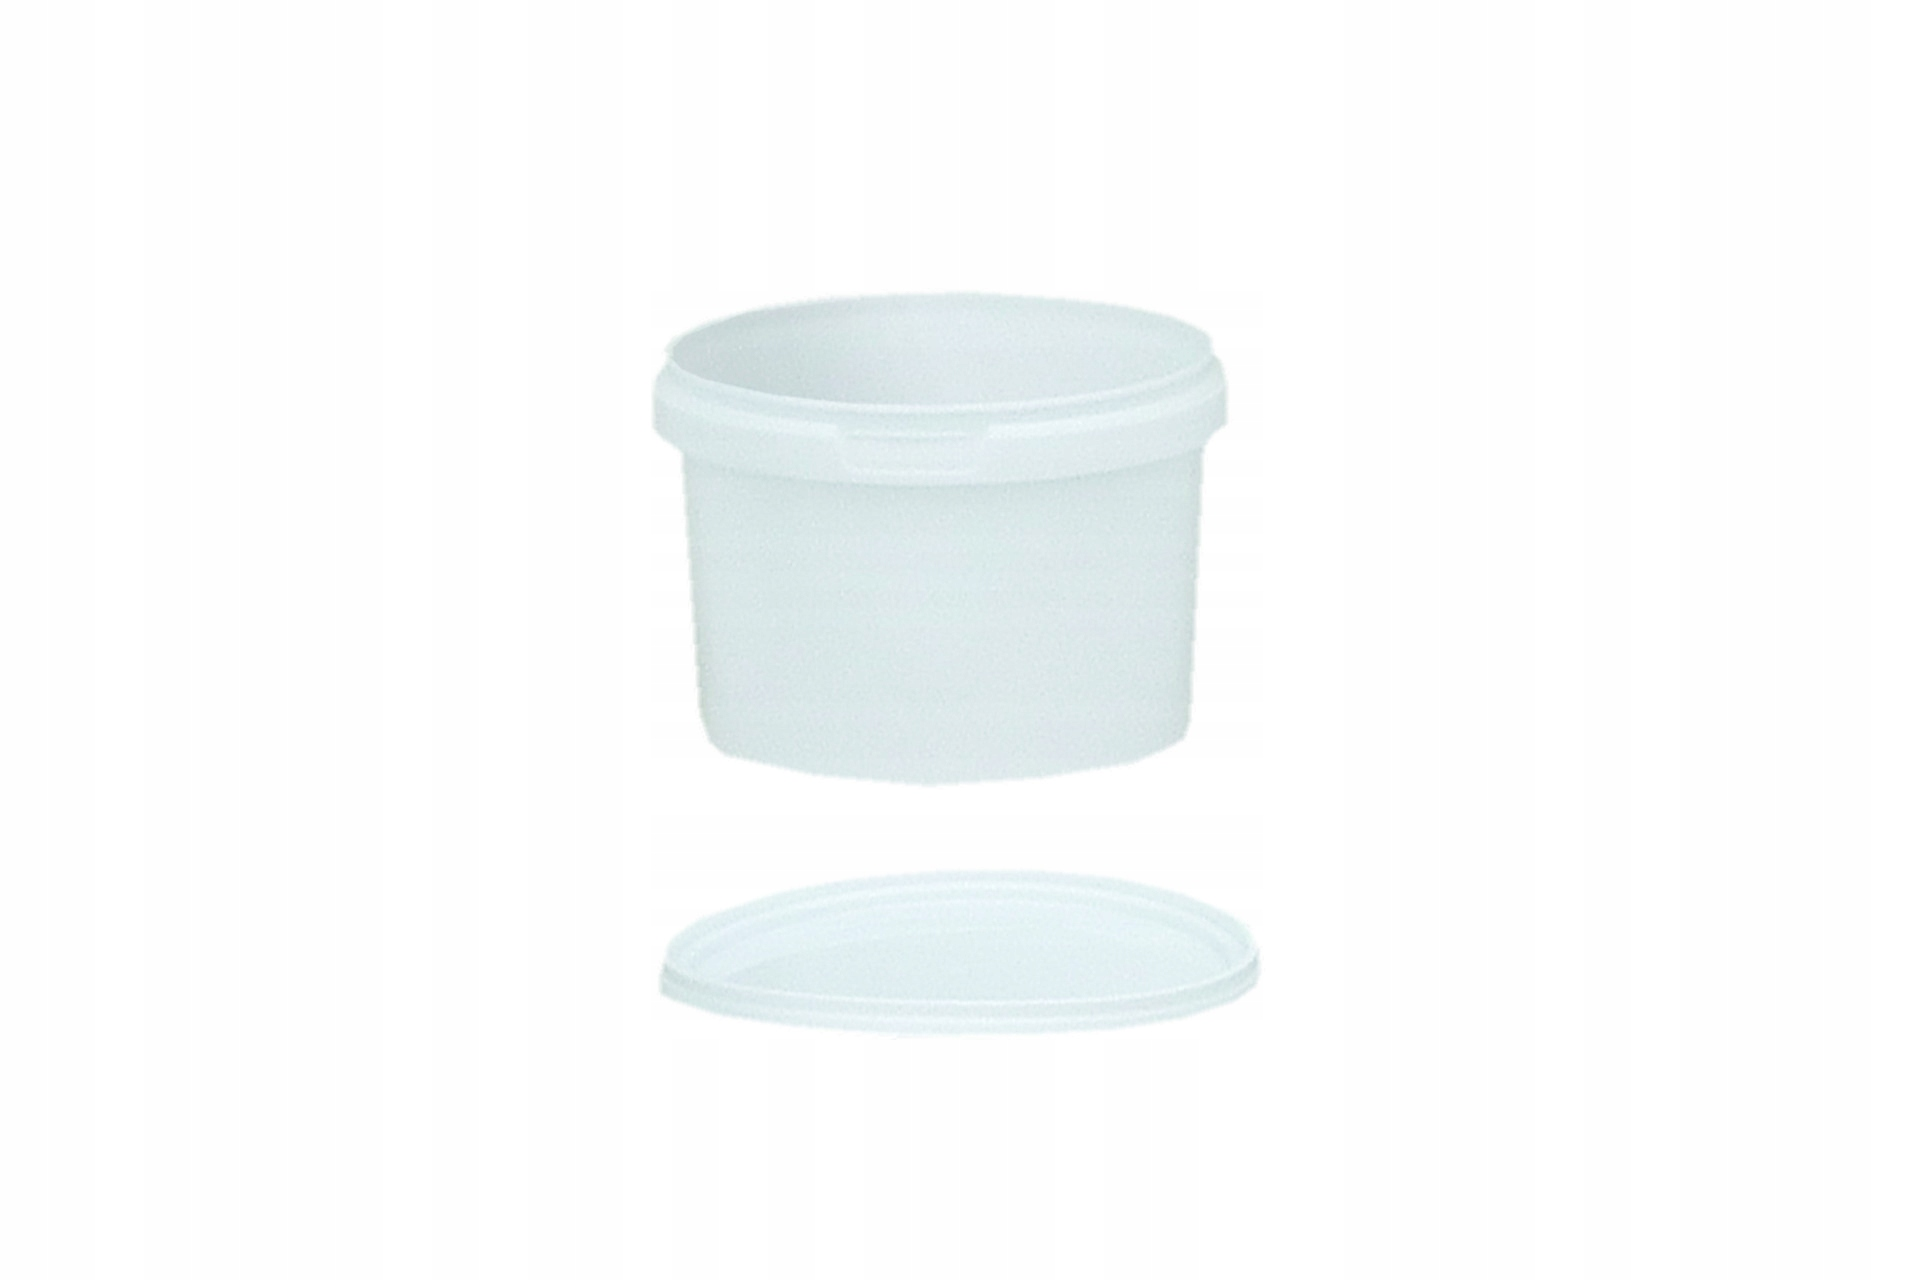 Болл Пластиковый контейнер краски 0,55 л